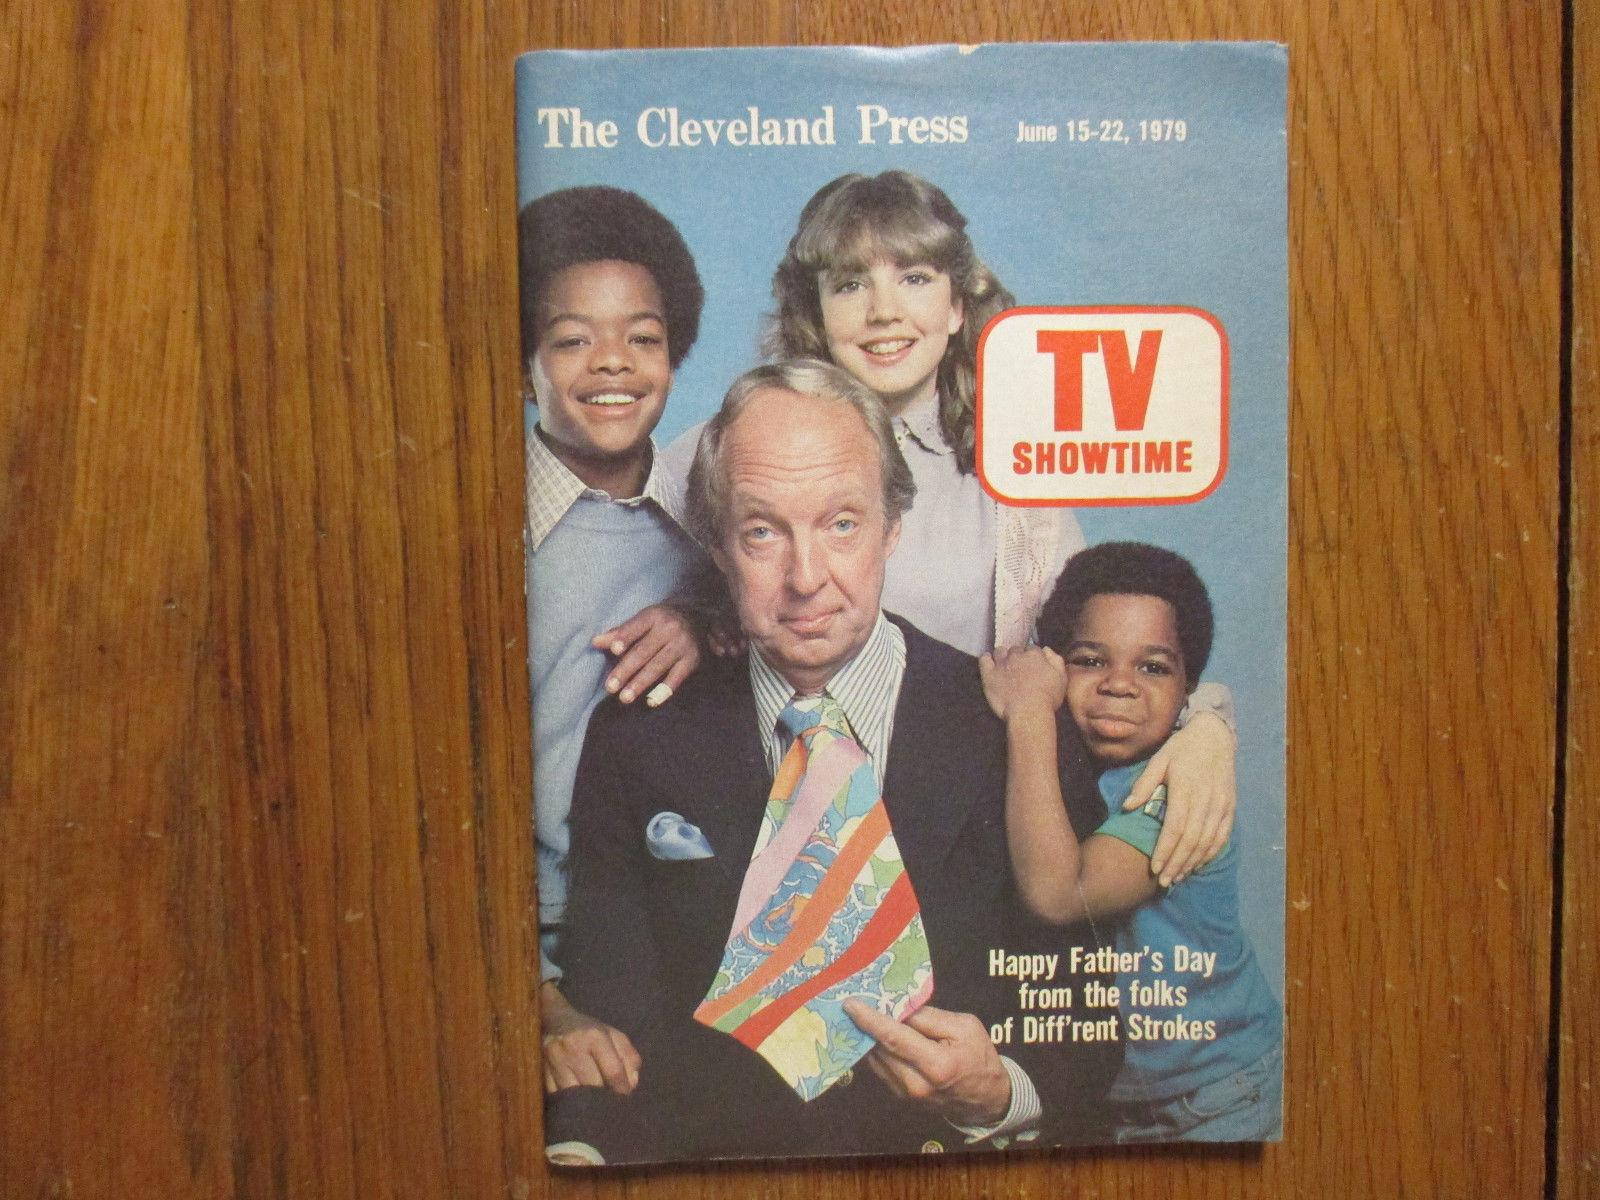 Ju-1979_Cleveland_Press_TV_Showtime_Mag